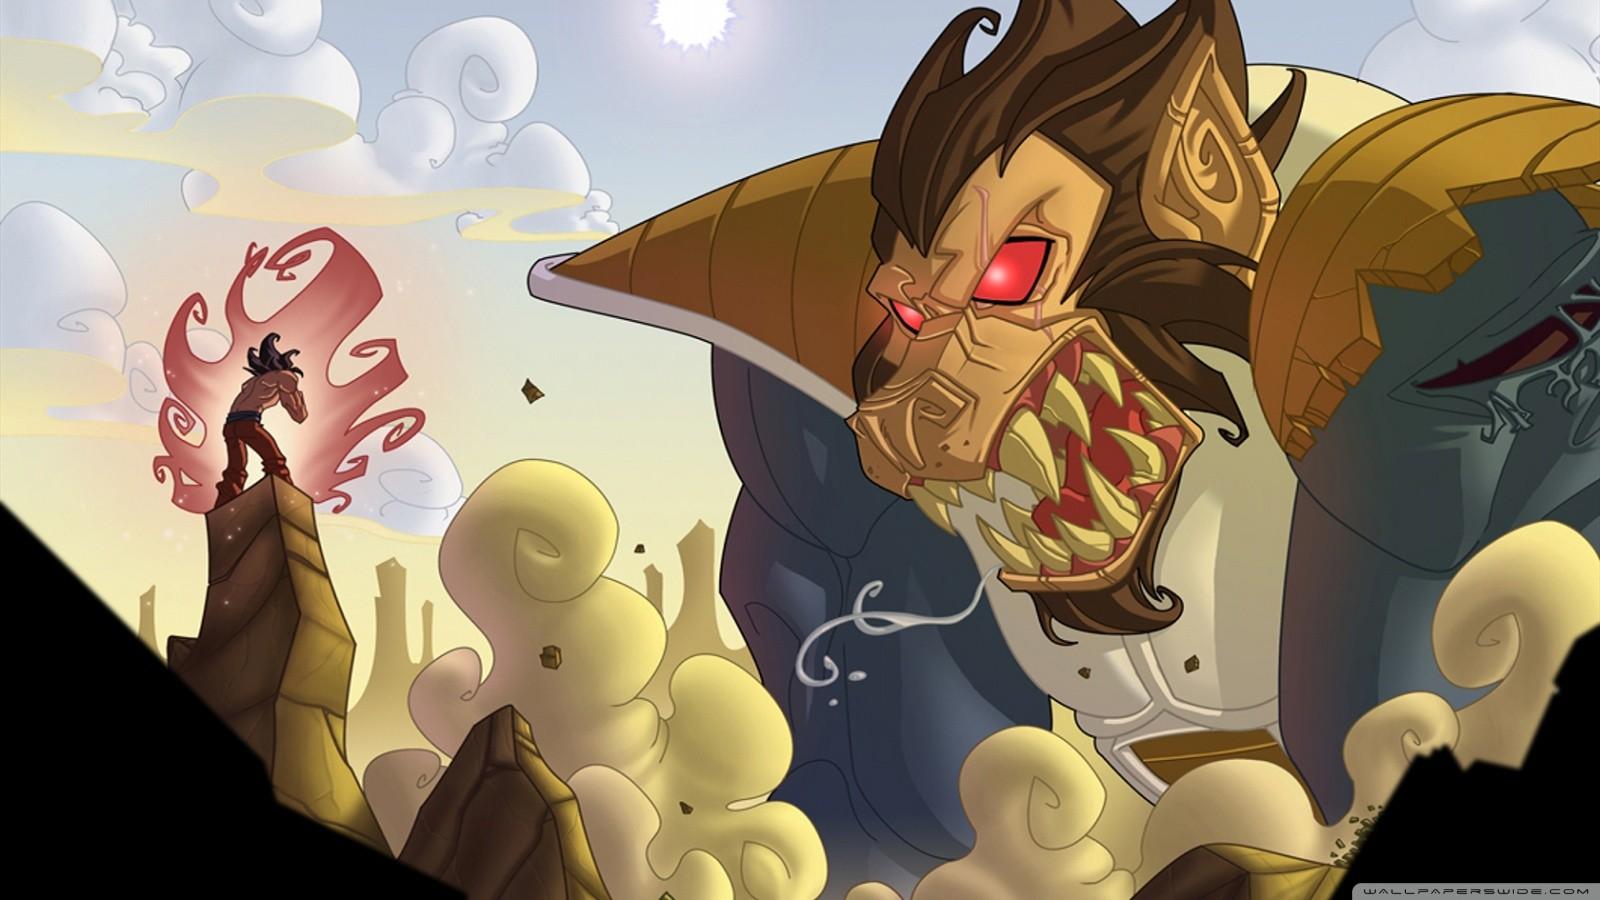 Vegeta Goku Wallpaper 1600x900 Vegeta Goku Anime Dragon Ball Z 1600x900